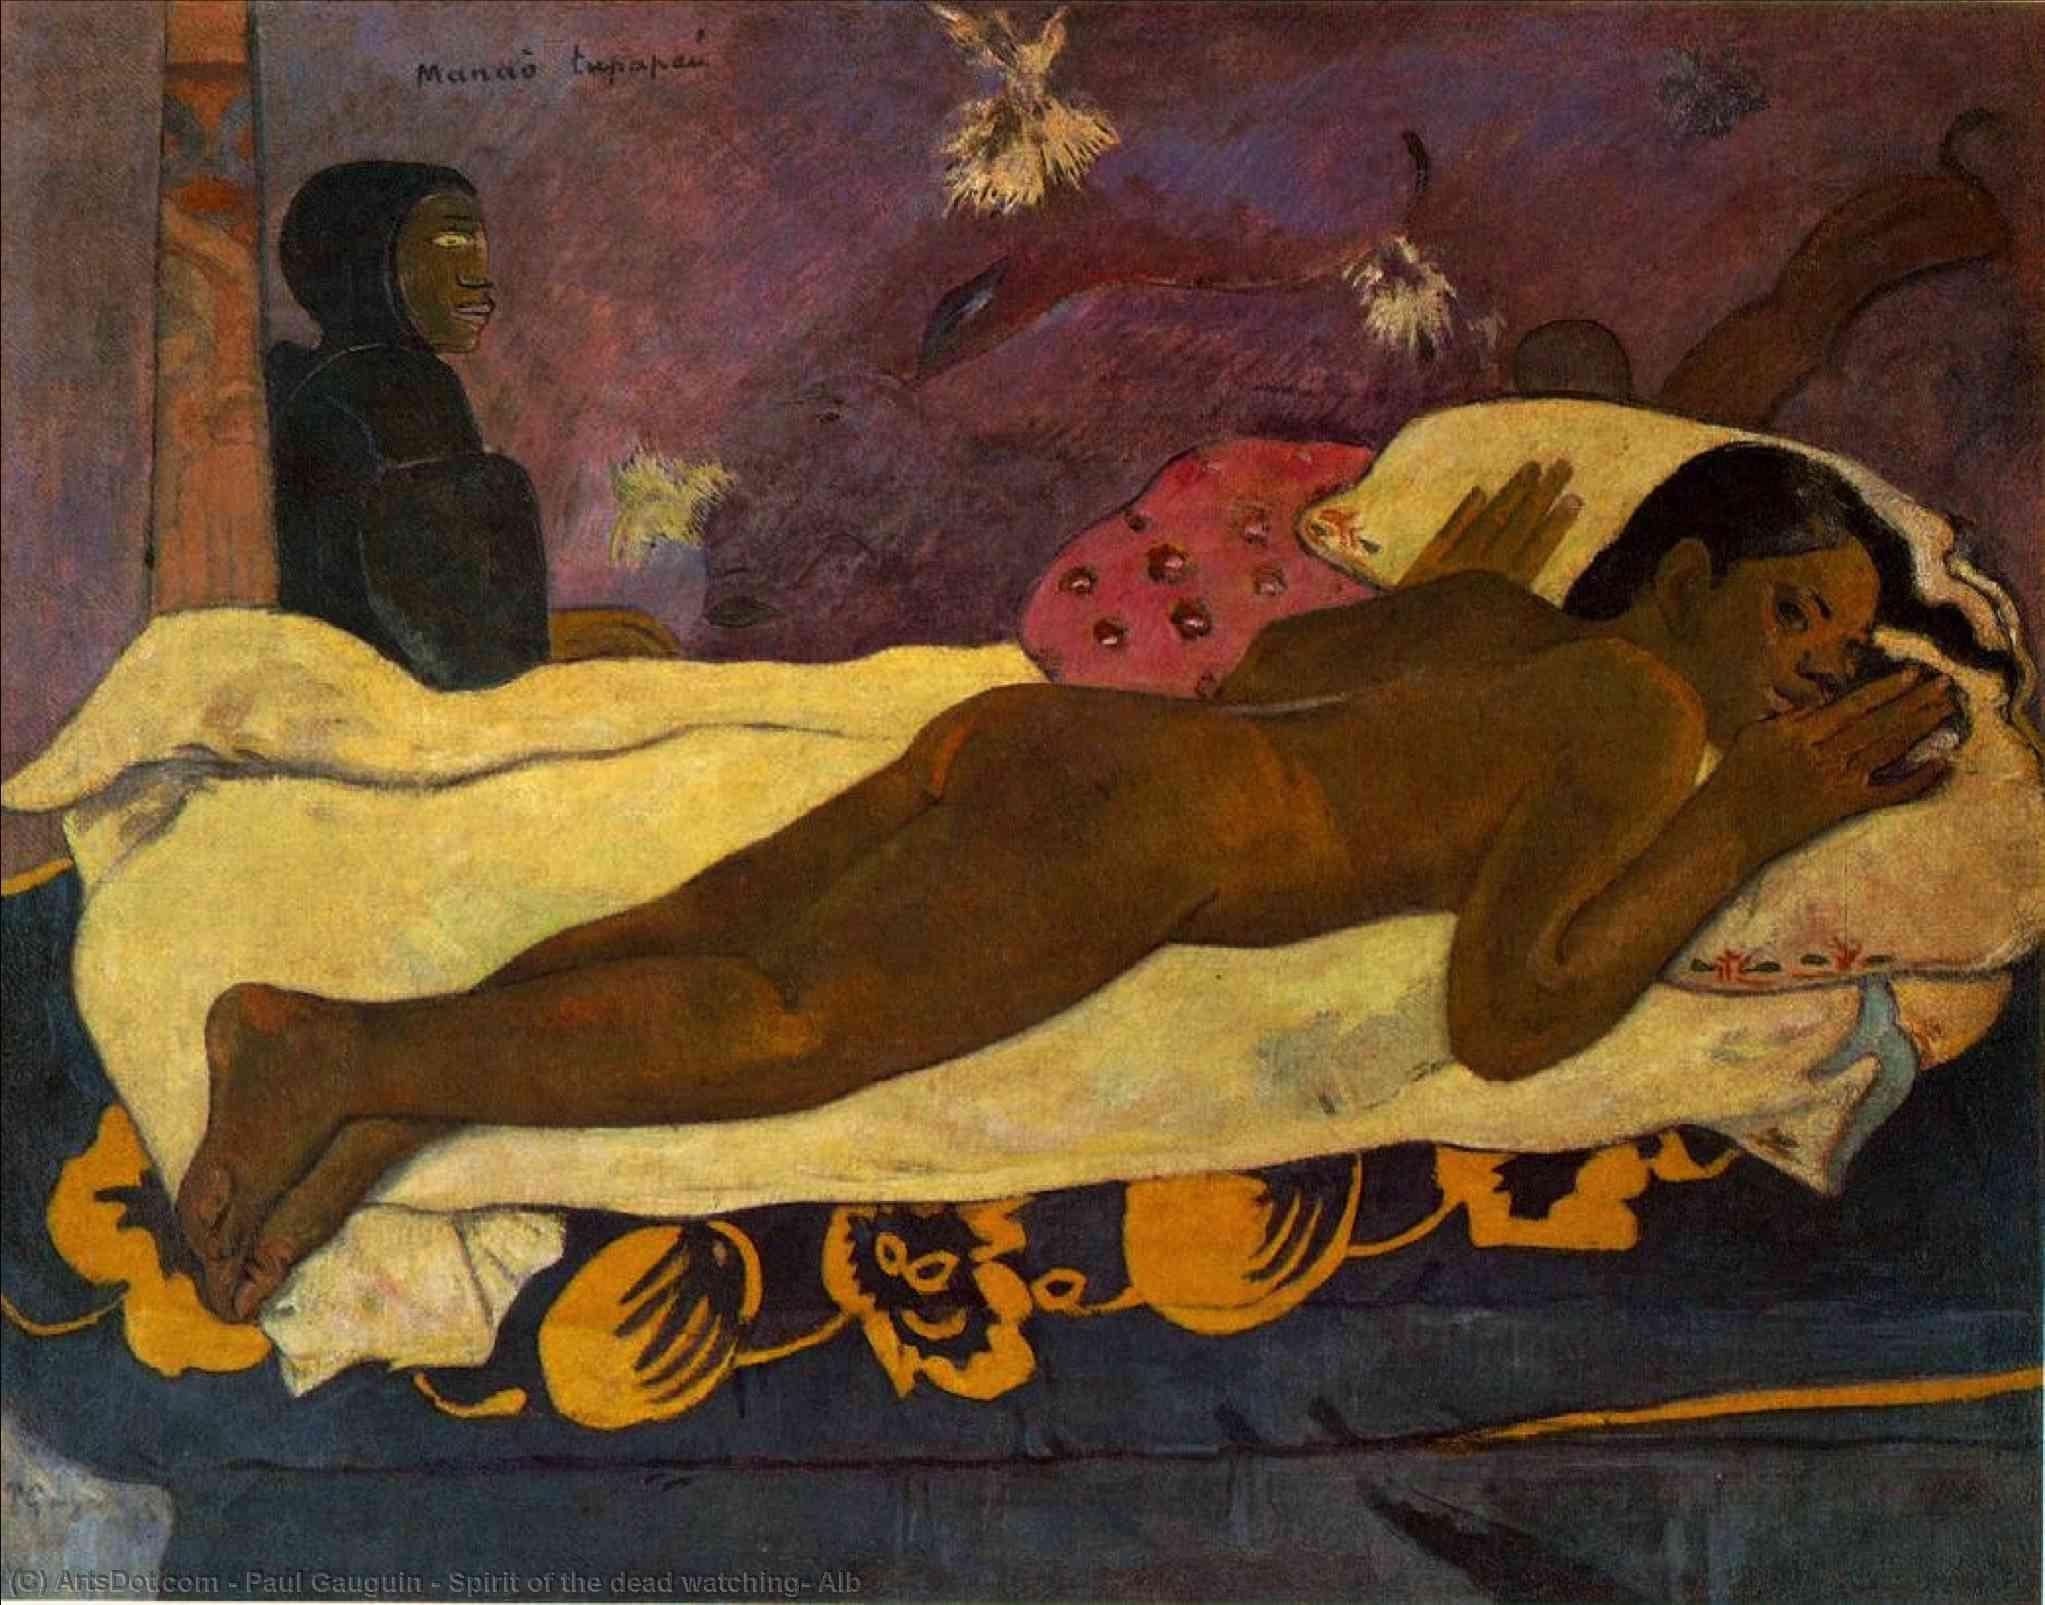 WikiOO.org - Güzel Sanatlar Ansiklopedisi - Resim, Resimler Paul Gauguin - Spirit of the dead watching, Alb